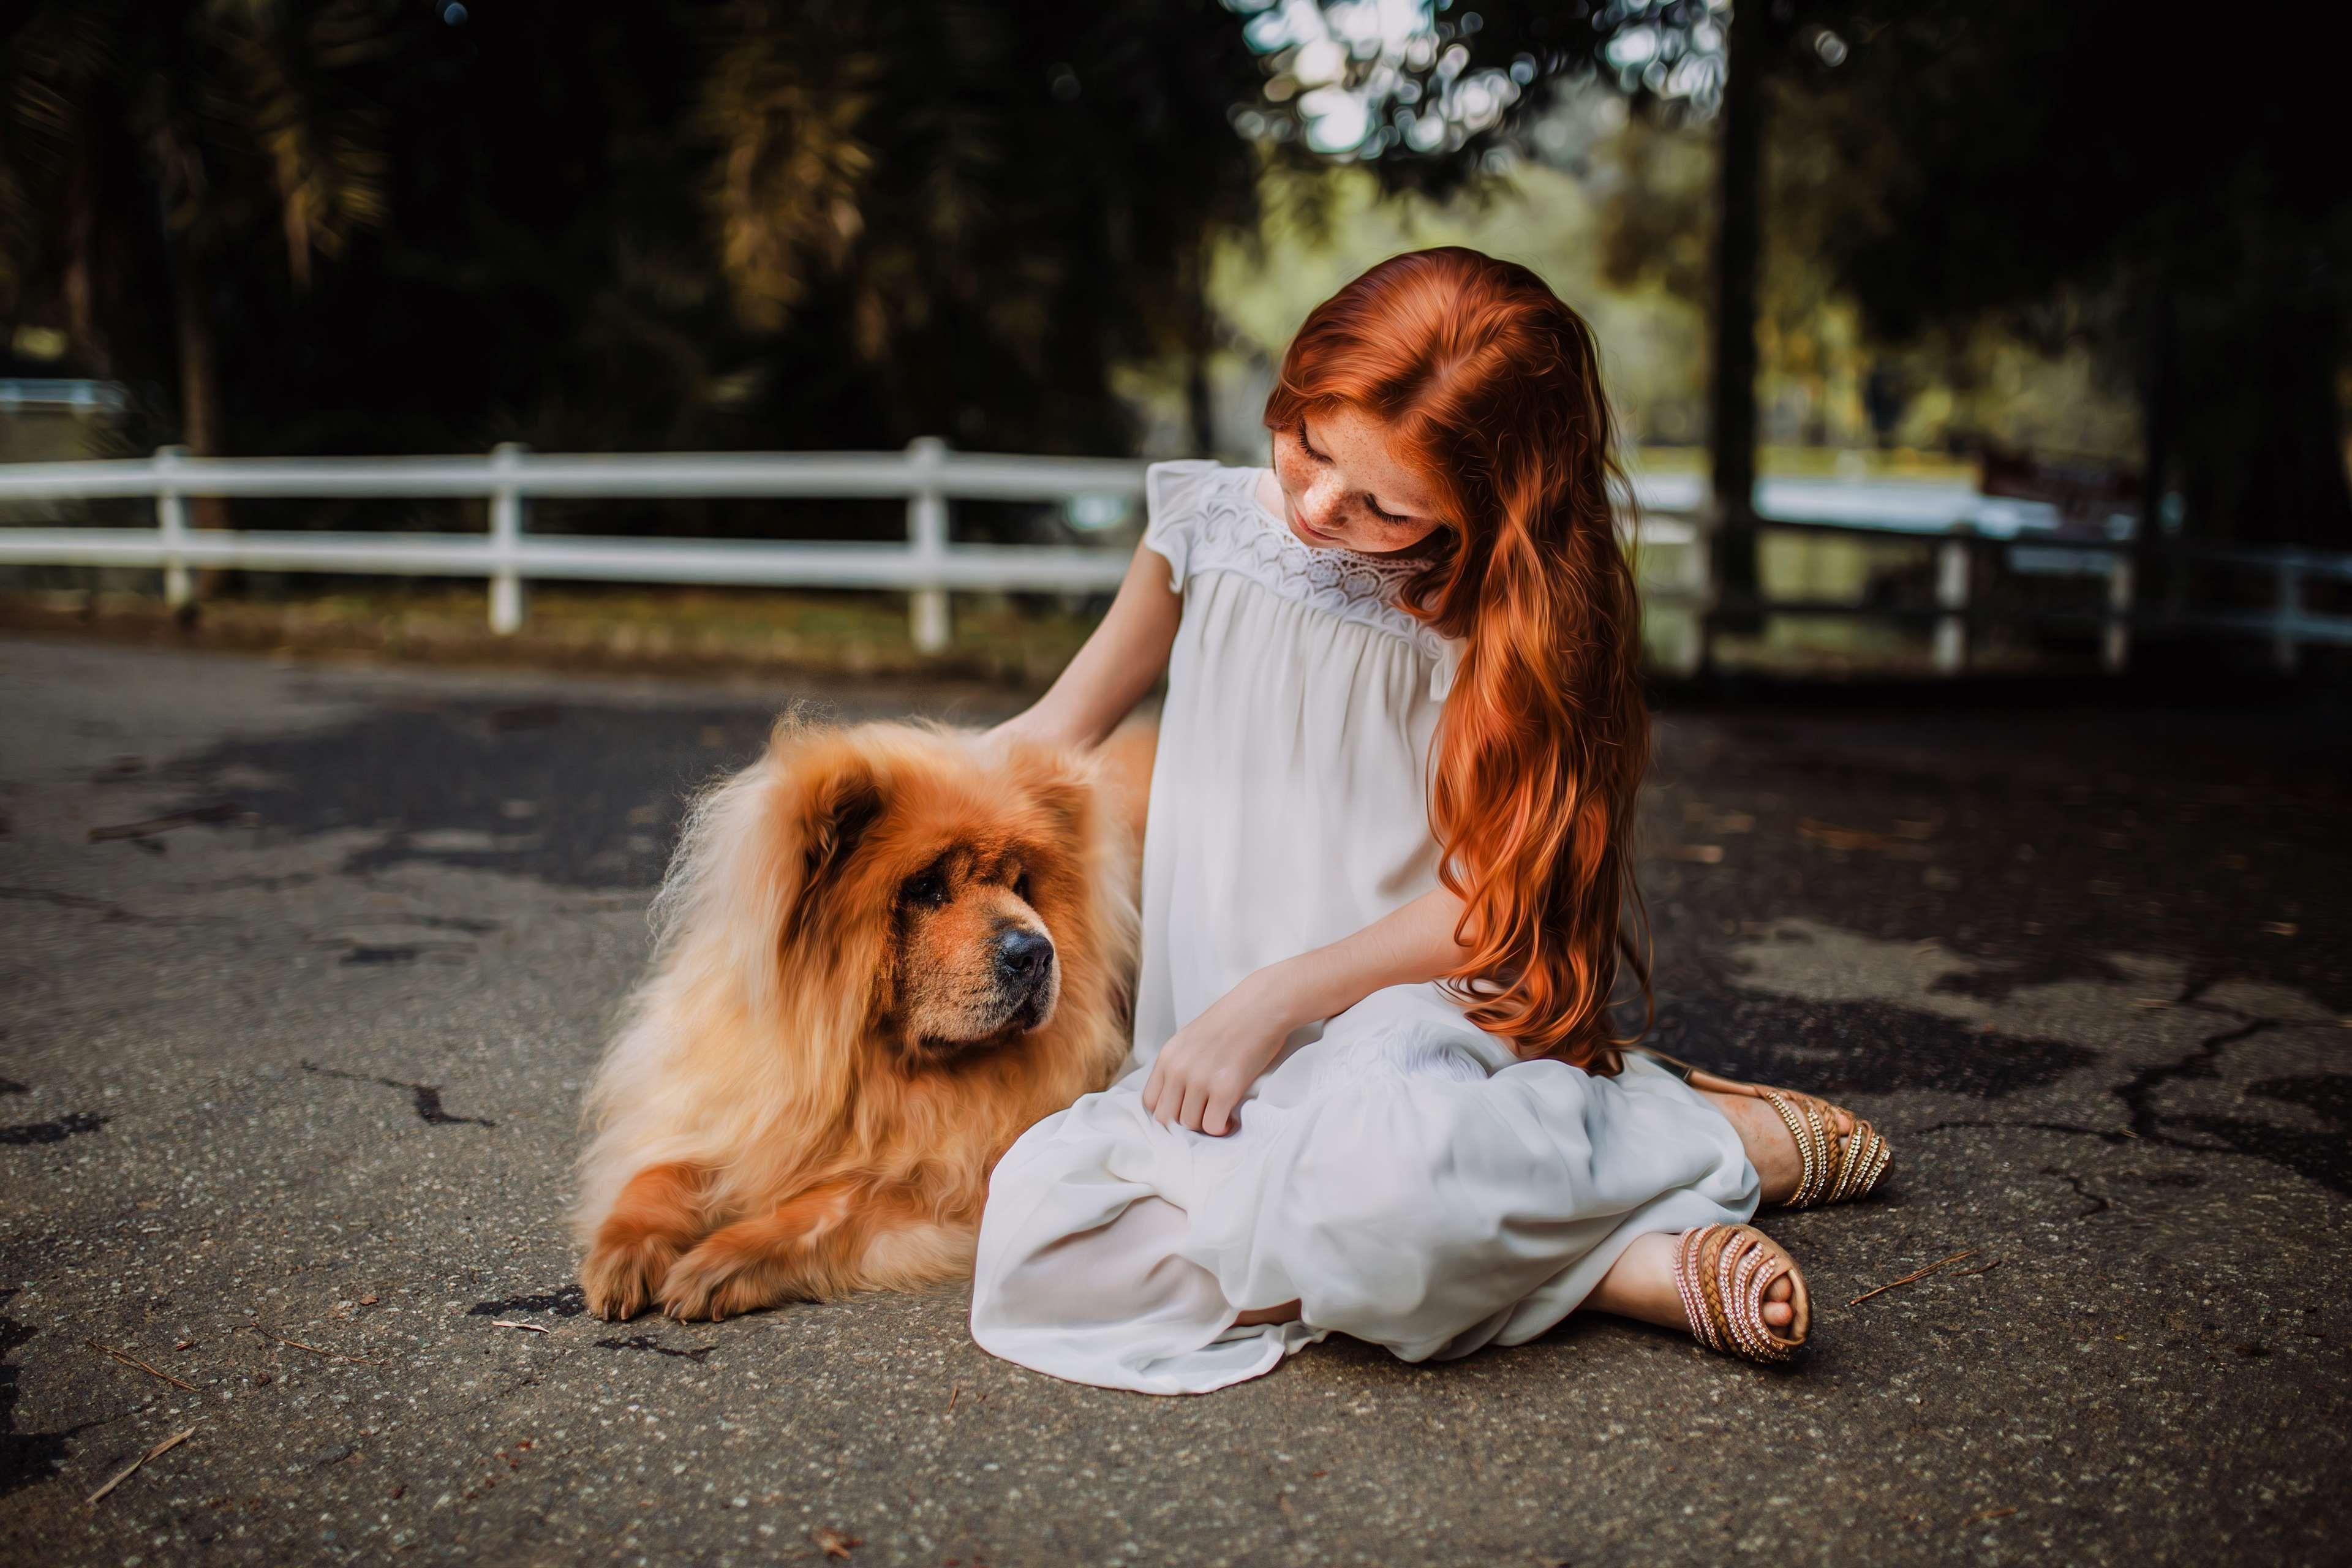 Great Spitz Canine Adorable Dog - 62ccfa93c38fba22083be2a0f6fd6997  2018_109638  .jpg